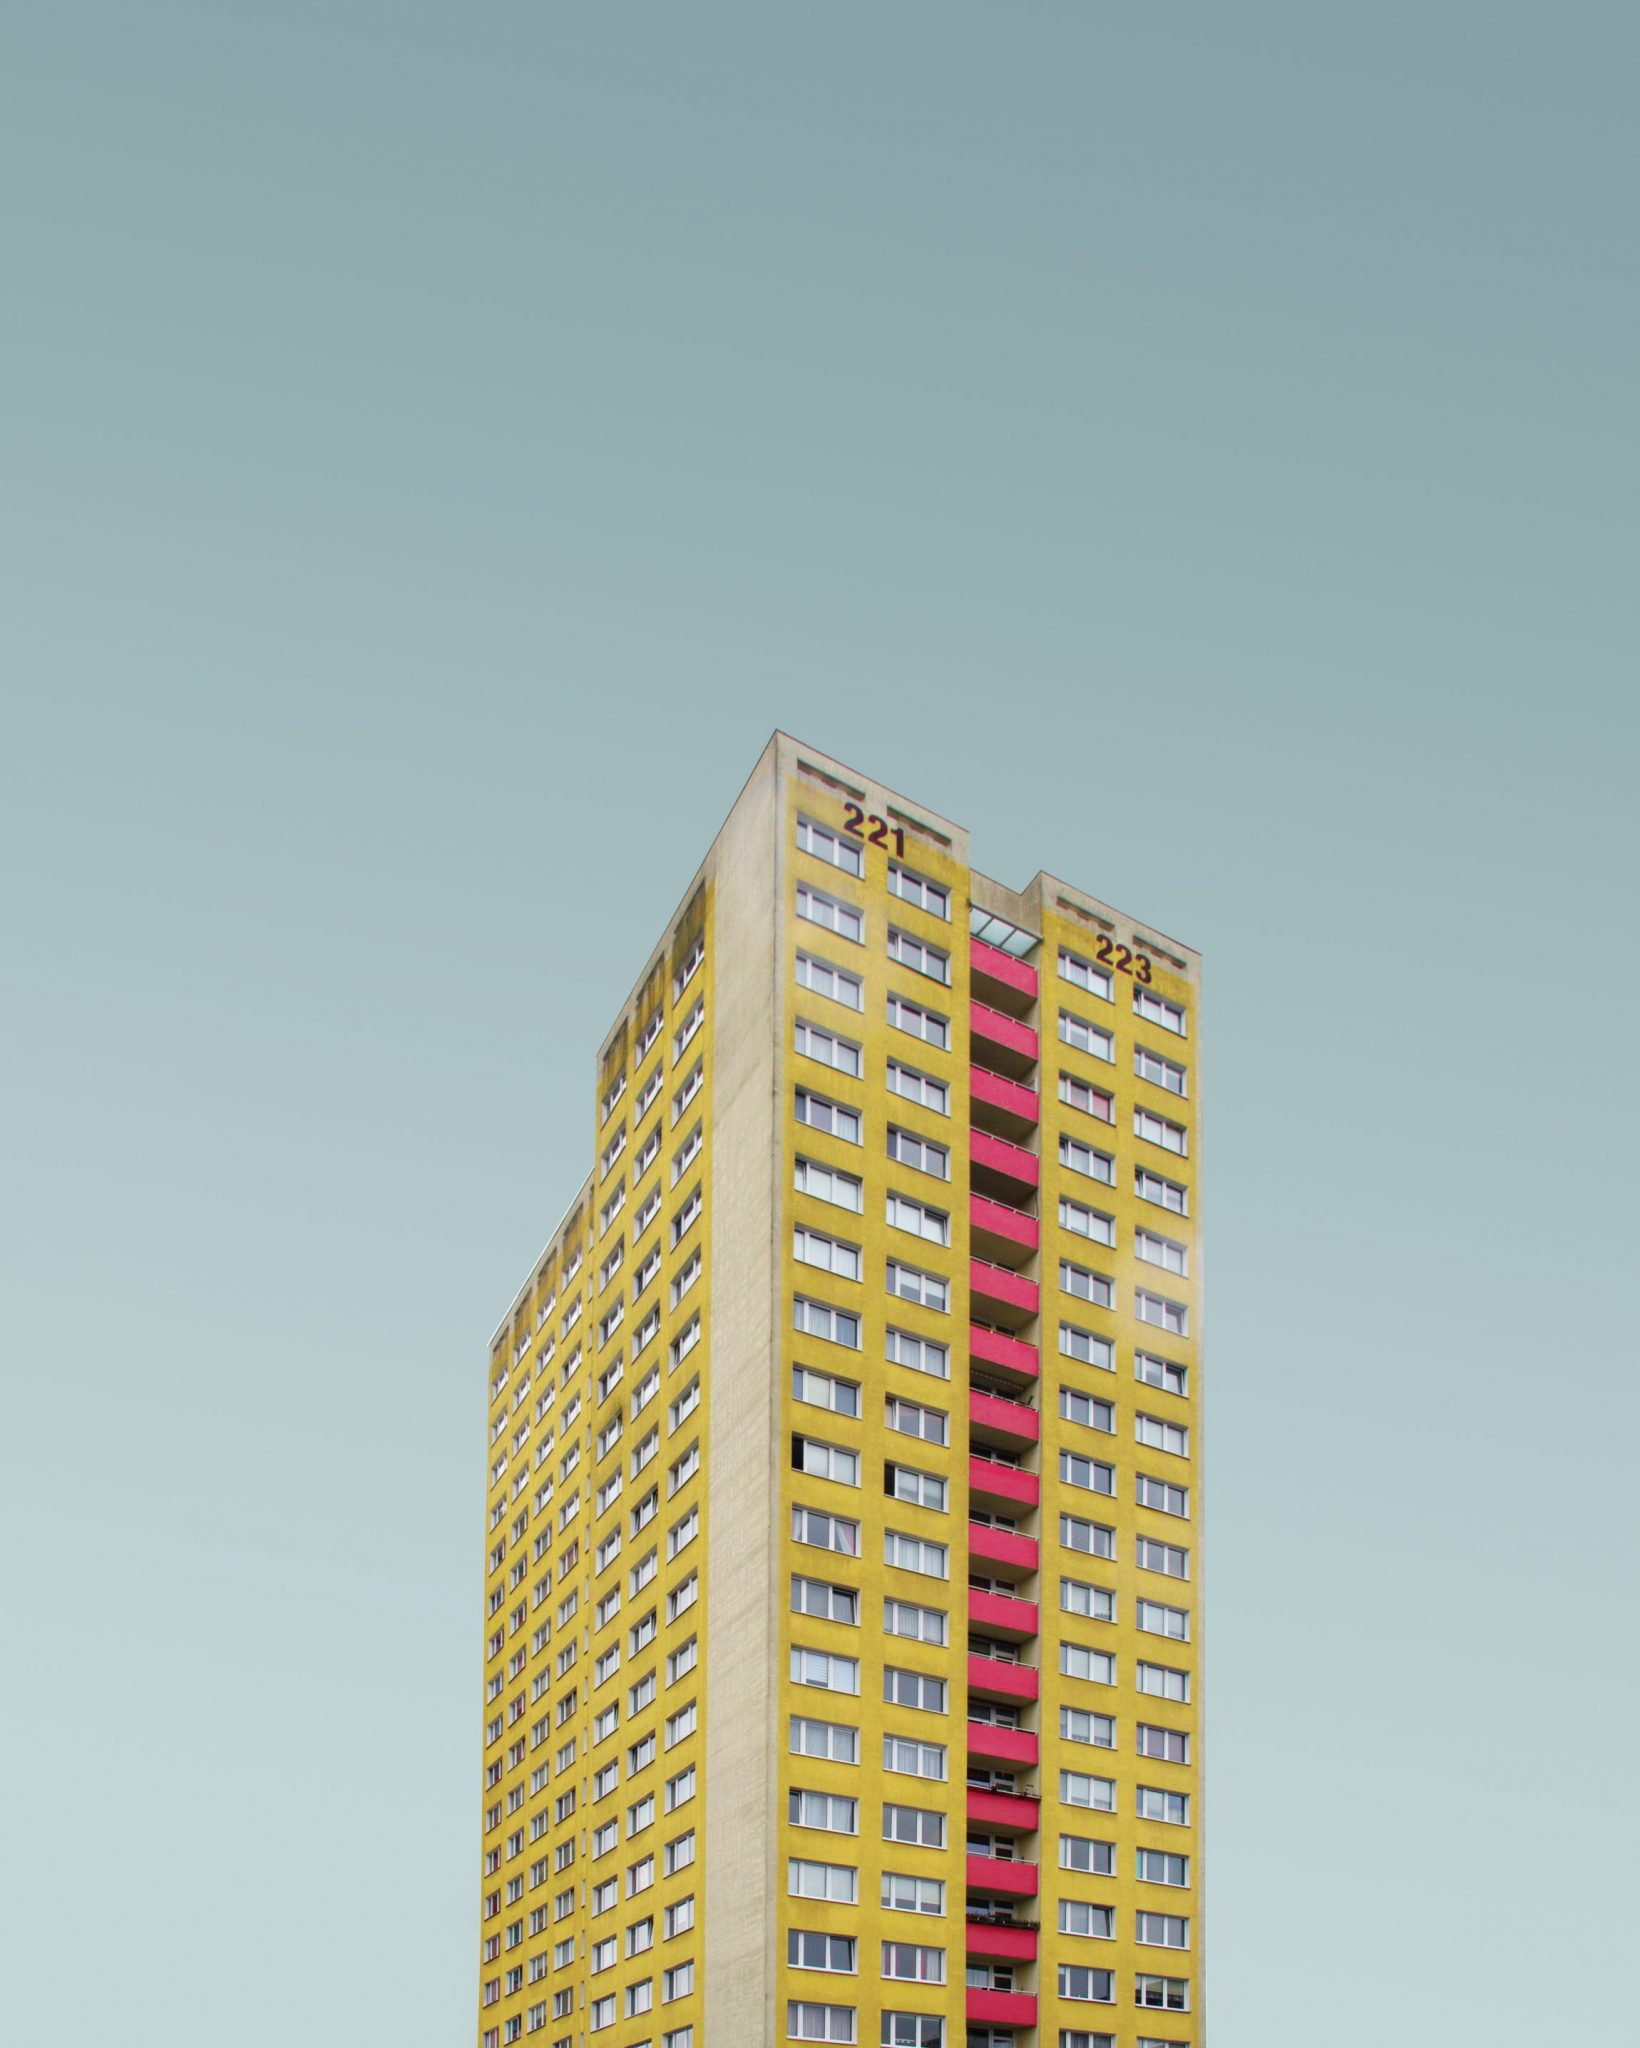 Wohnblock in Berlin, Simone Hutsch, CC0 unsplash